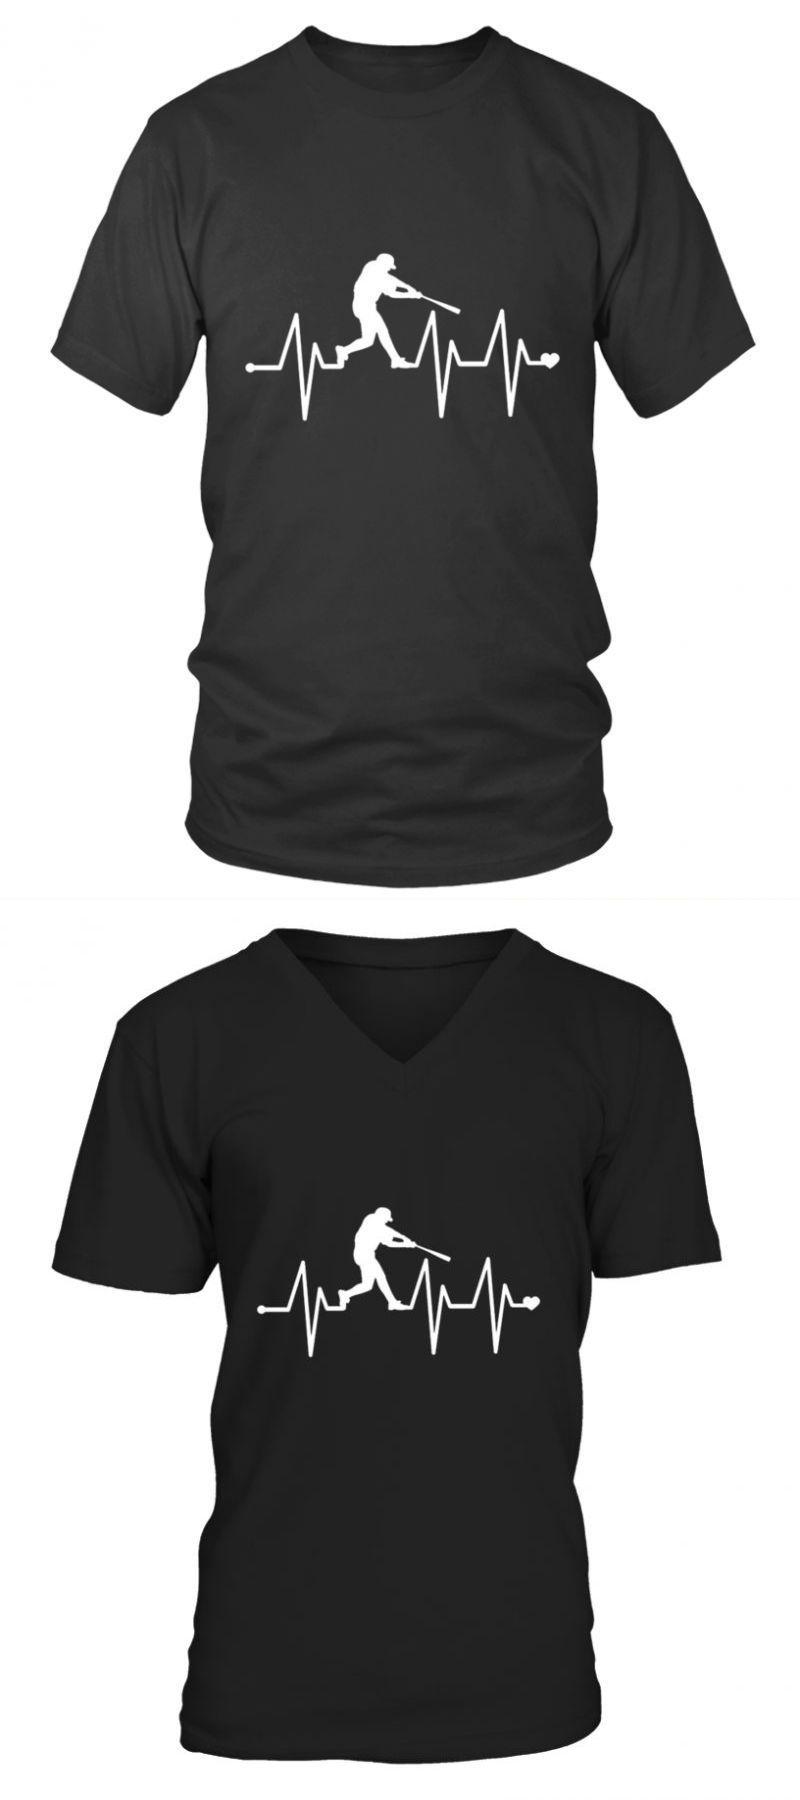 25507feb Baseball t shirt cheap baseball heartbeat pulse shirt baseball t-shirt  design templates #baseball #shirt #cheap #heartbeat #pulse #t-shirt #design  ...